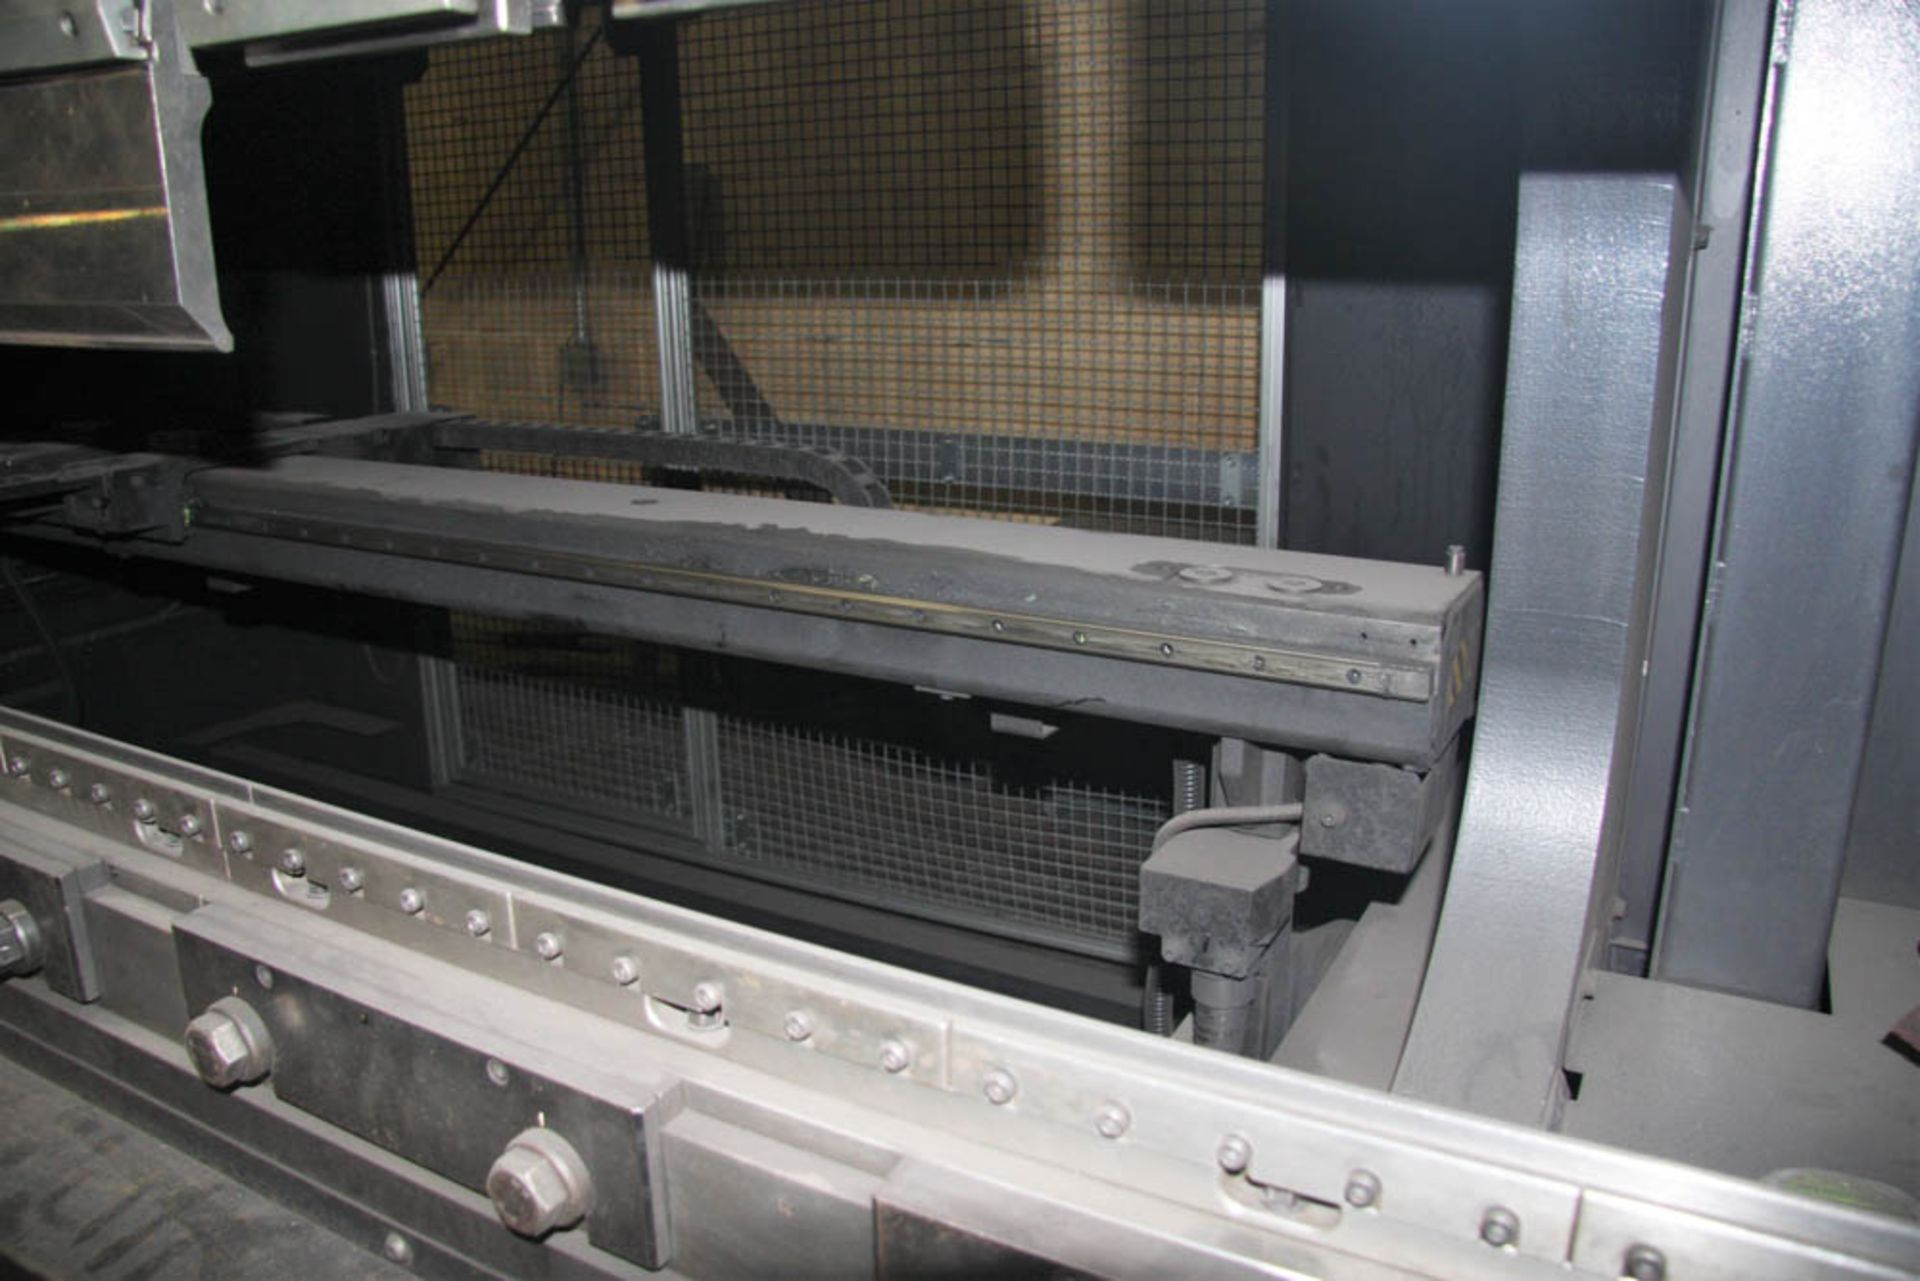 "2015 187 US TON X 122"" AMADA MDL. HG1703 CNC PRESS BRAKE, AMNC 3i CONTROL, 122"" MAX BEND LENGTH - Image 7 of 14"